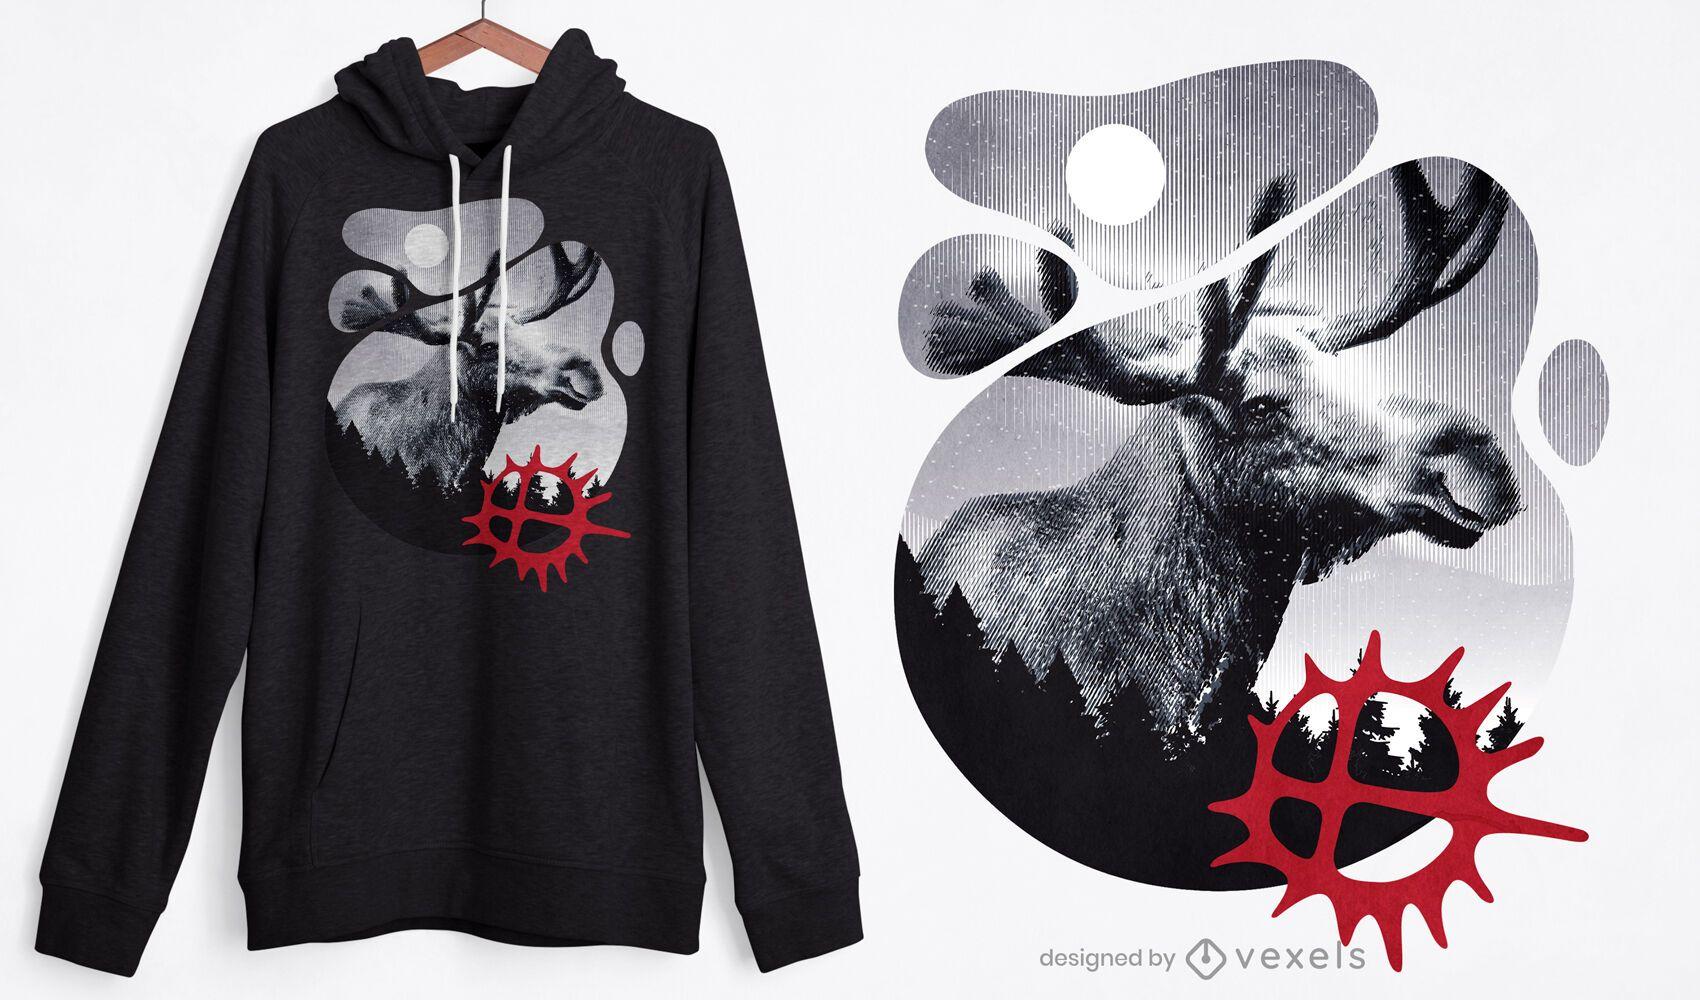 Moose nature t-shirt design